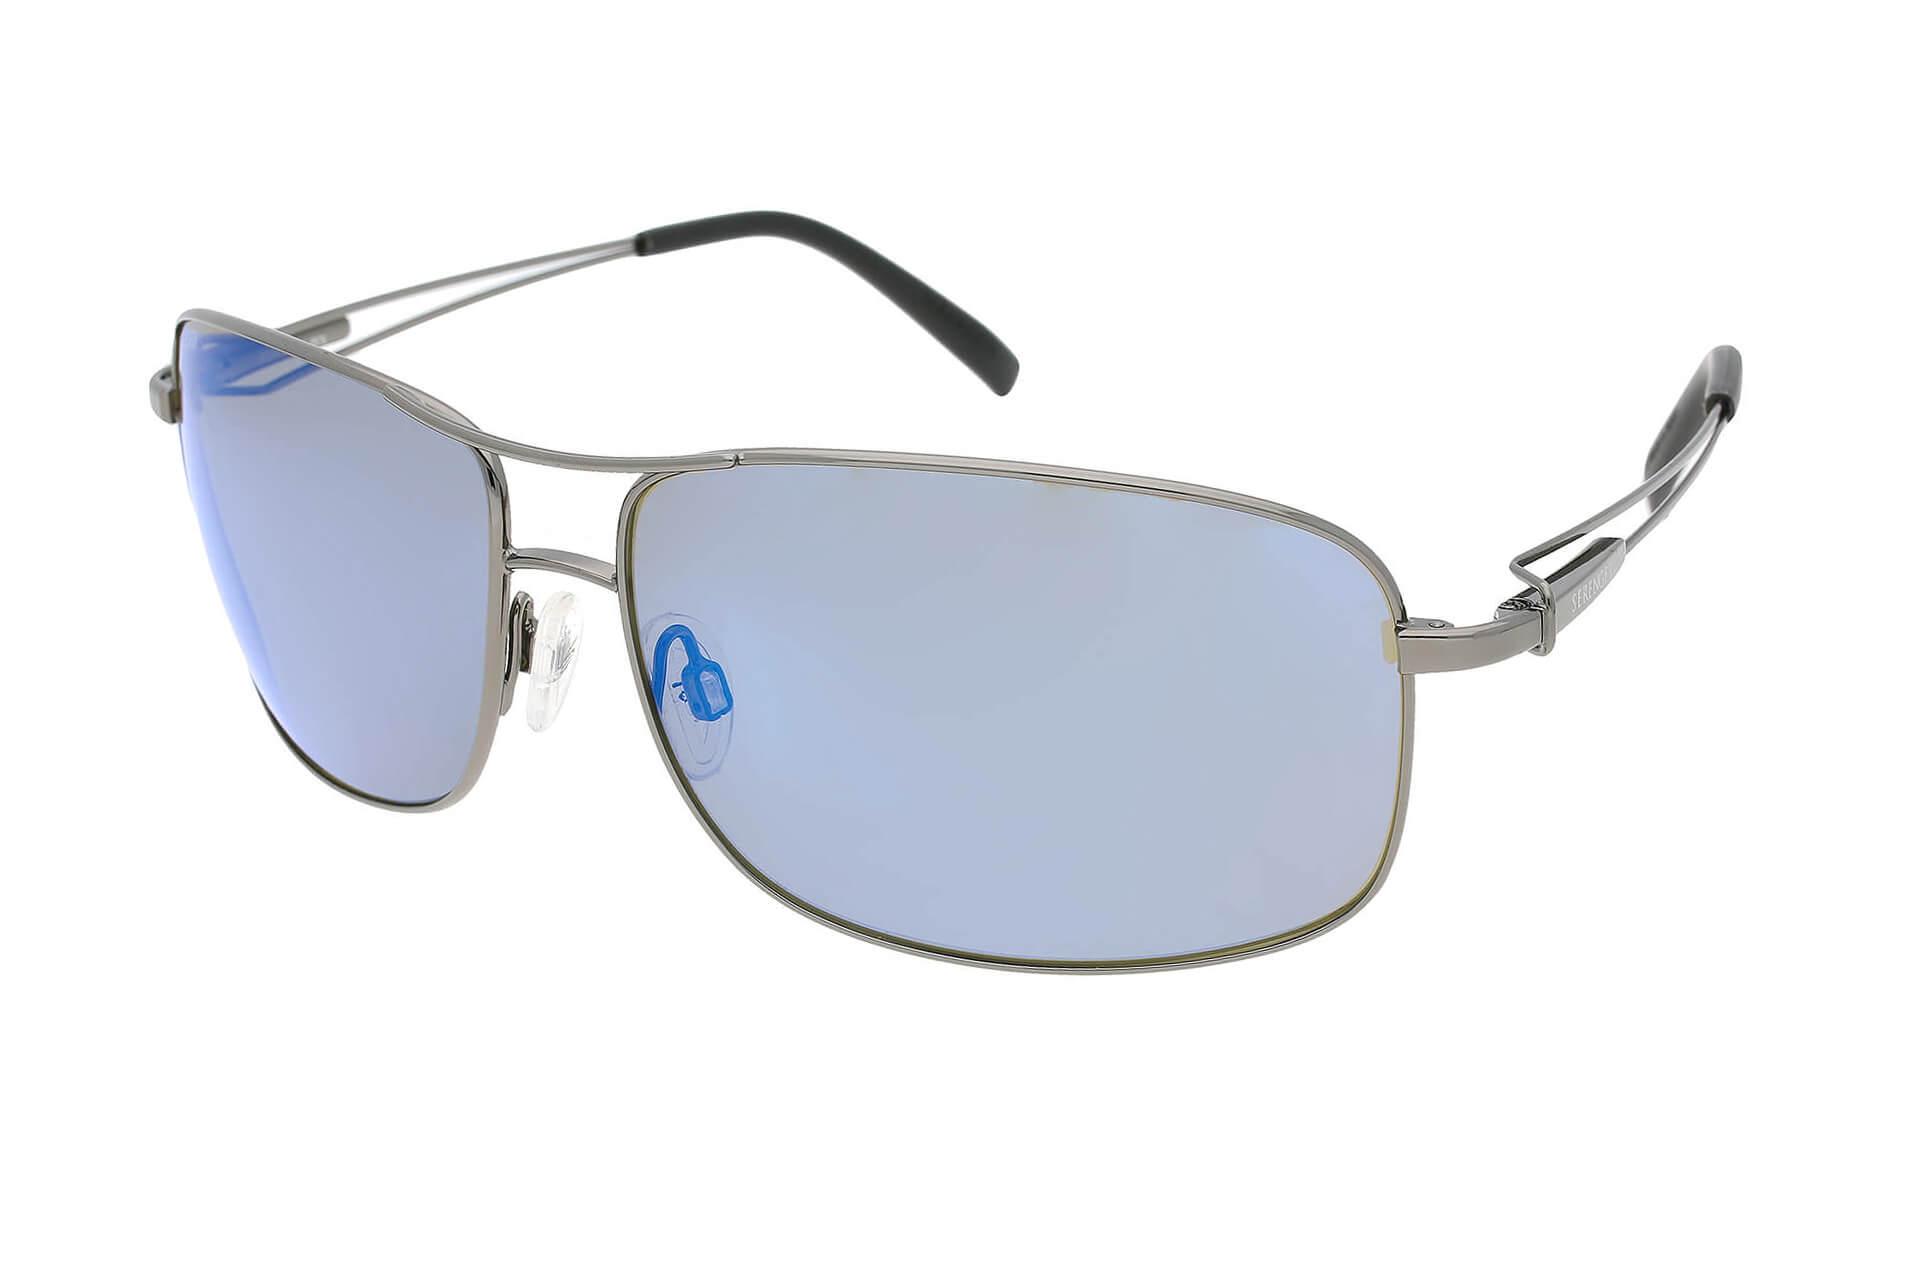 Serengeti Sonnenbrille SASSARI 8596 • Polarized 555nm Blue